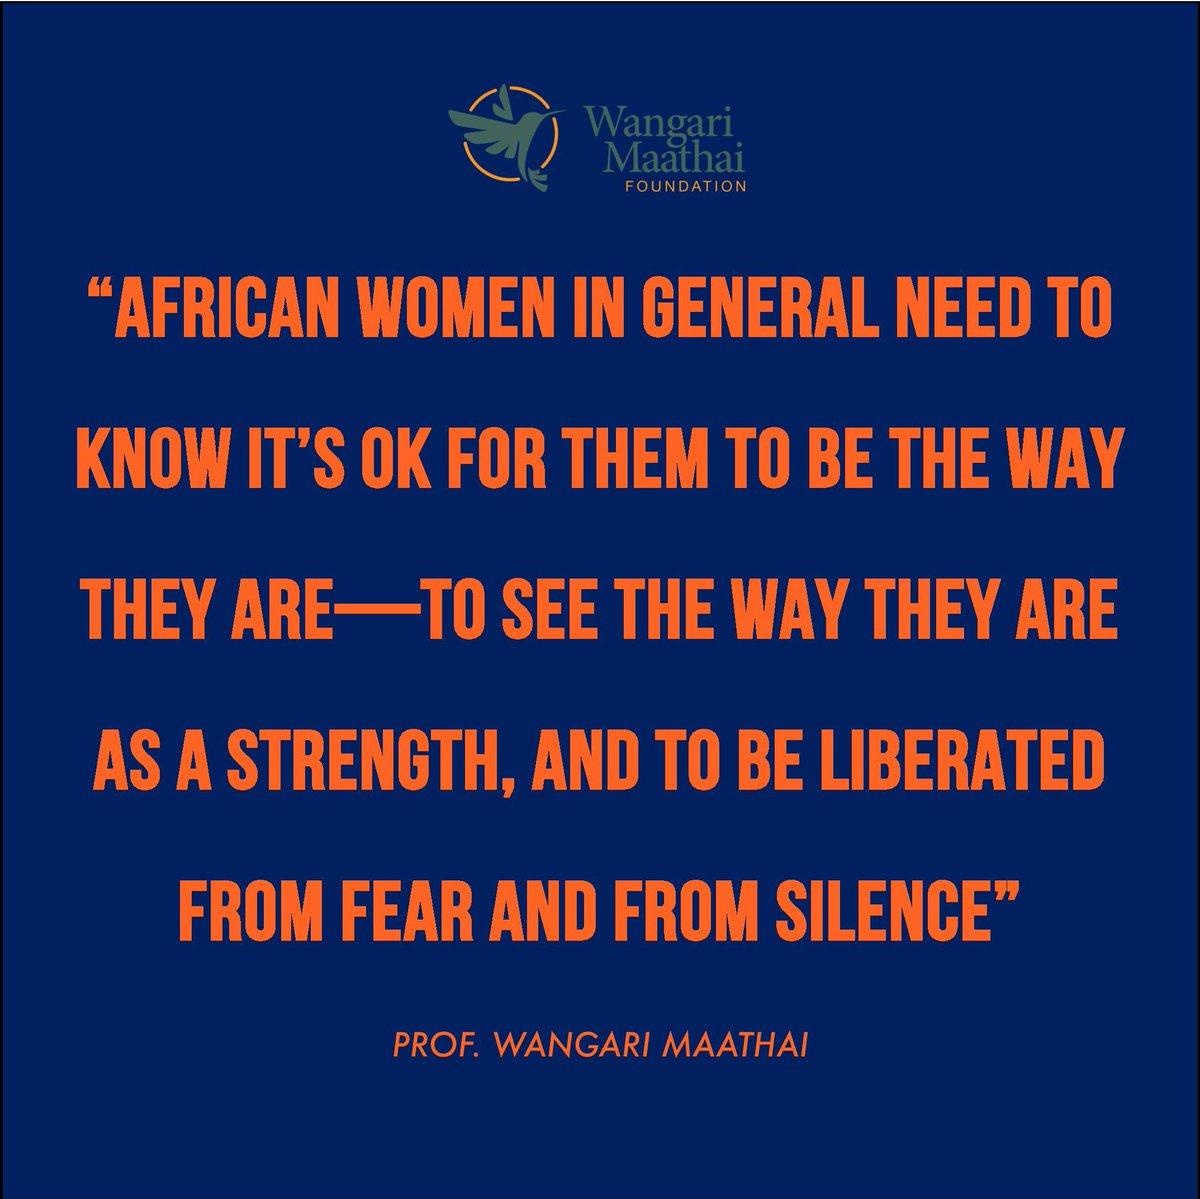 Happy International Women's Day #CourageousLeadership #IWD2019